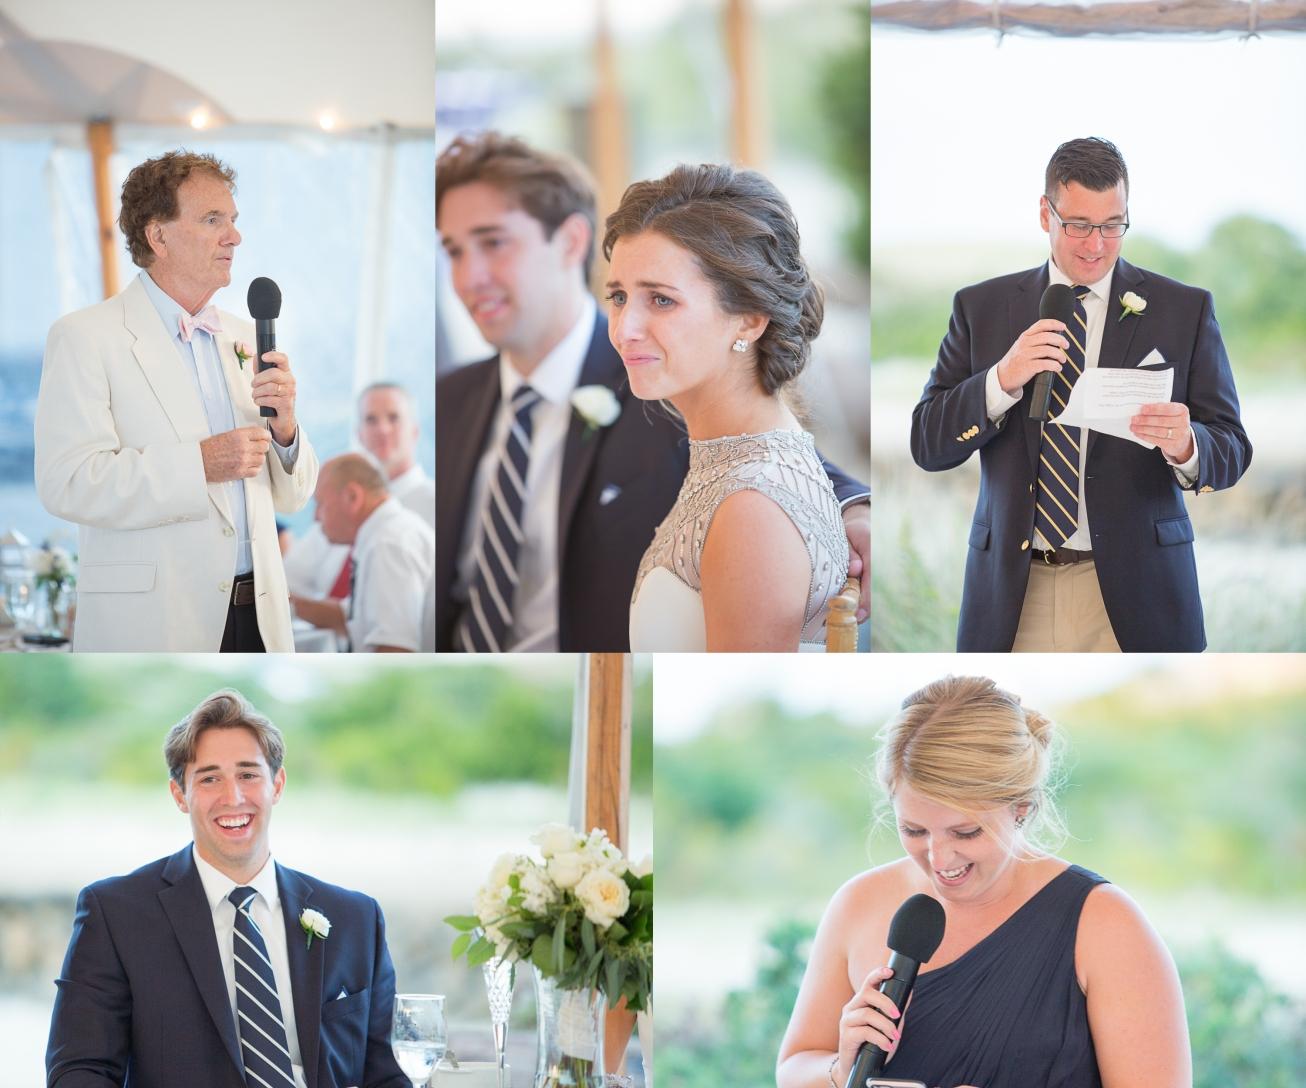 cape-cod-wedding-photographer-lisa-elizabeth-images-10-of-19